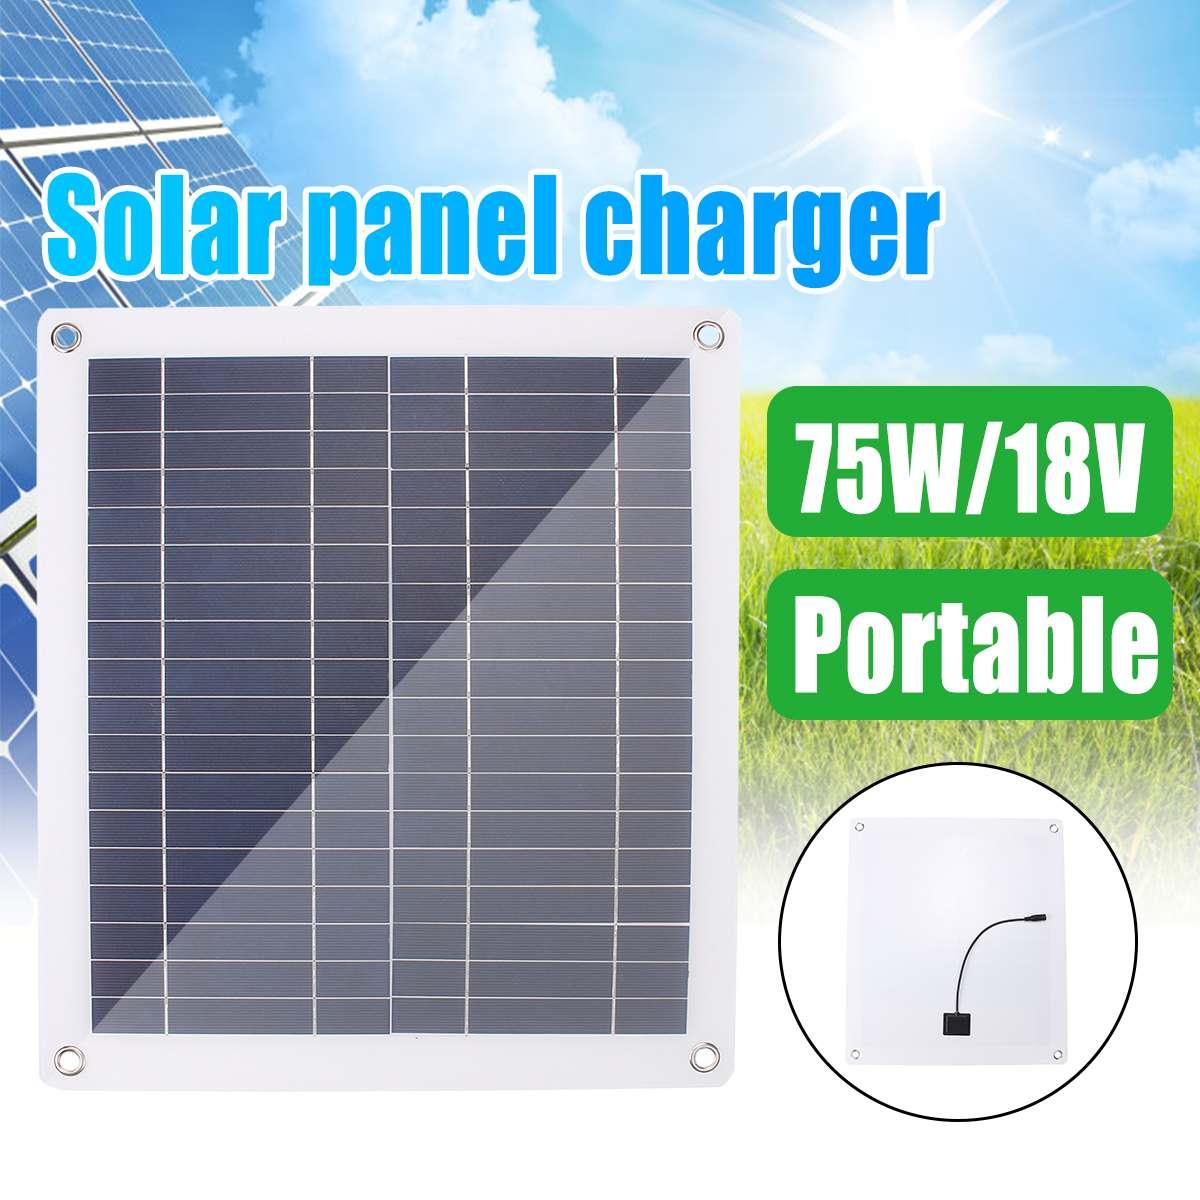 Módulo de células de Panel Solar de 75W, Kit DIY para caravana, coche, barco, uso doméstico, Panel de paneles solares de 18V con línea de Bus USB y CC Dual de 2 líneas